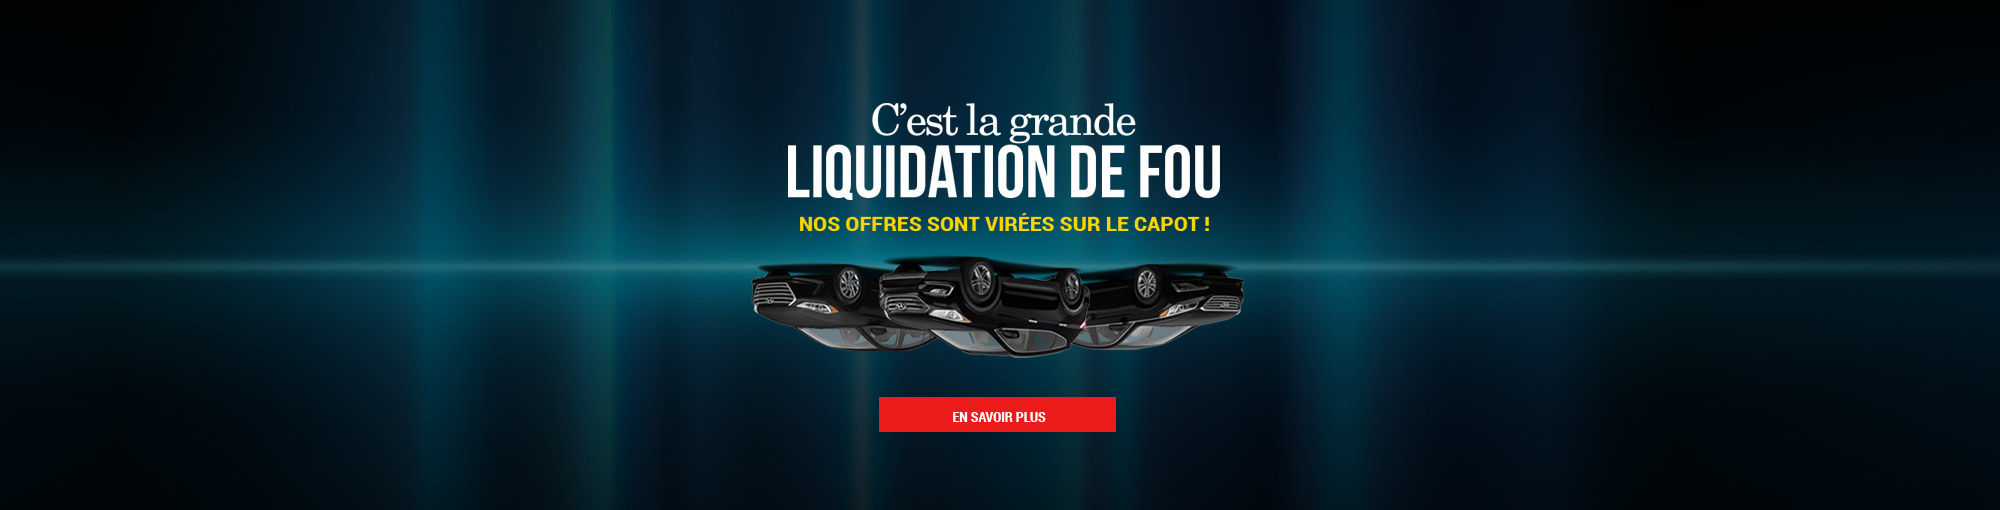 Liquidation FOU 2017 Hyundai Trois-Rivières Shawinigan 2017 #1